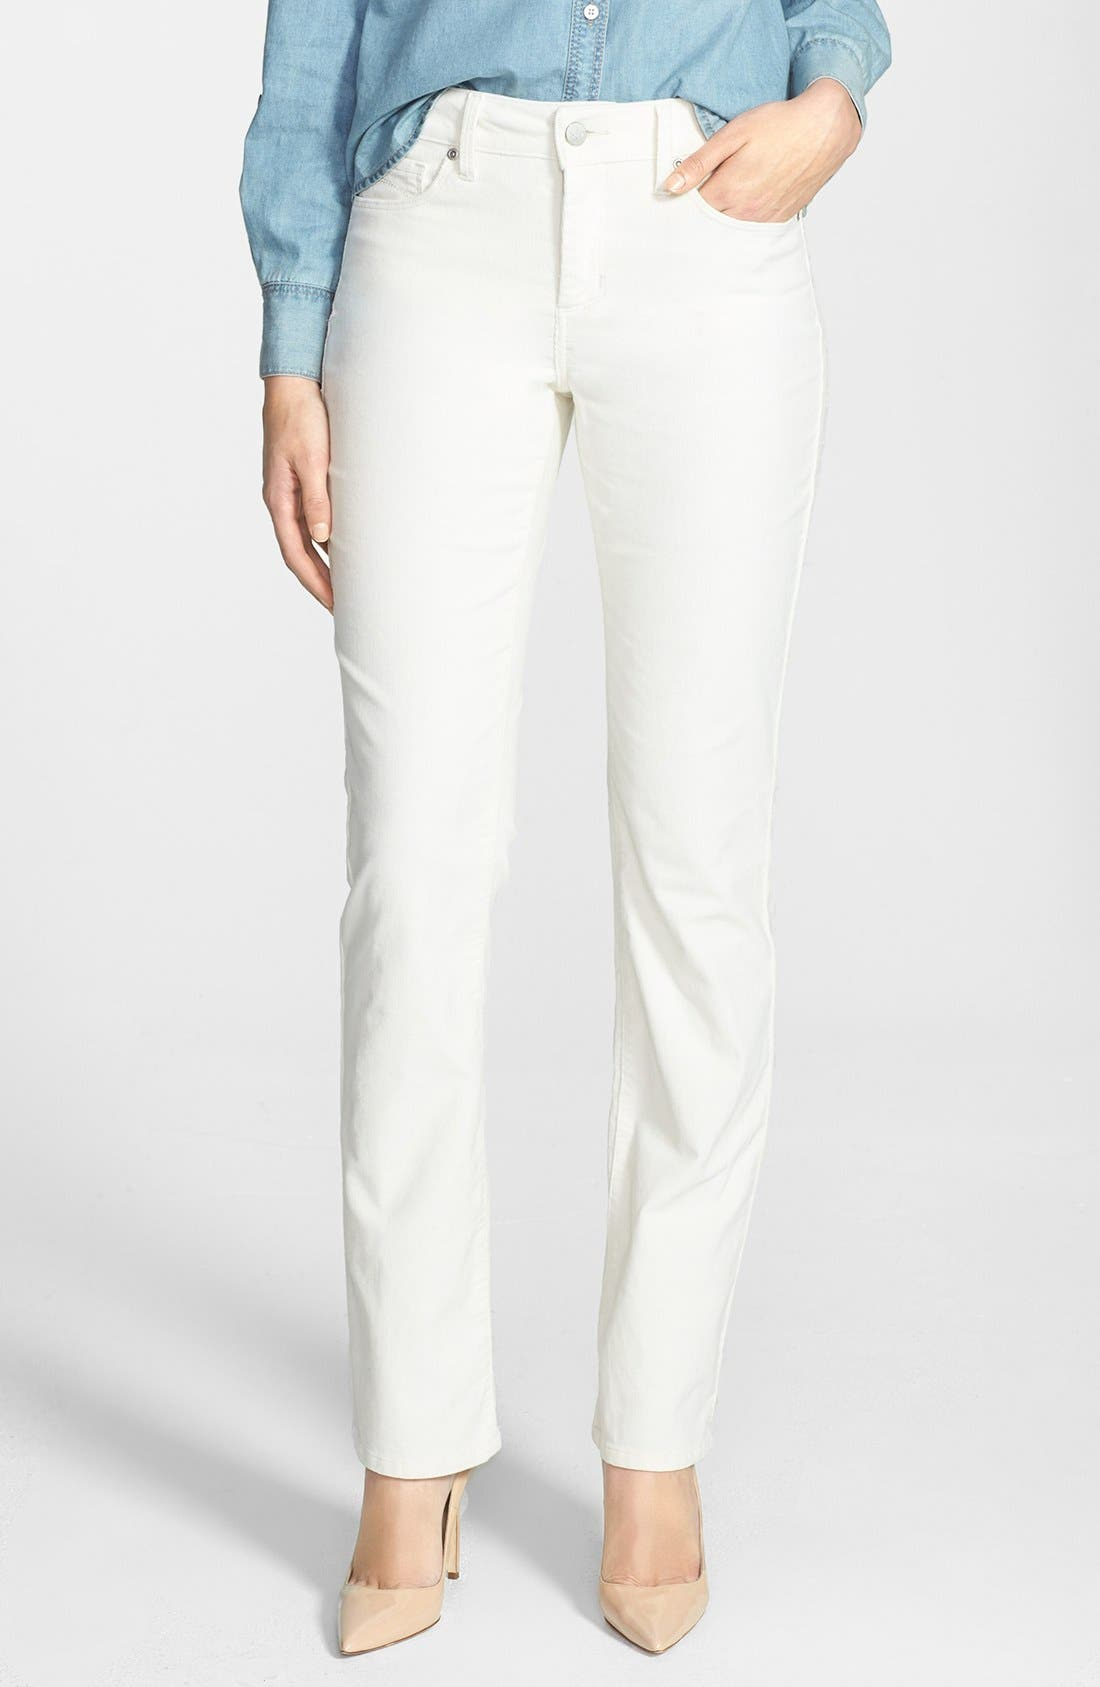 Alternate Image 1 Selected - NYDJ 'Marilyn' Colored Stretch Corduroy Straight Leg Pants (Petite)